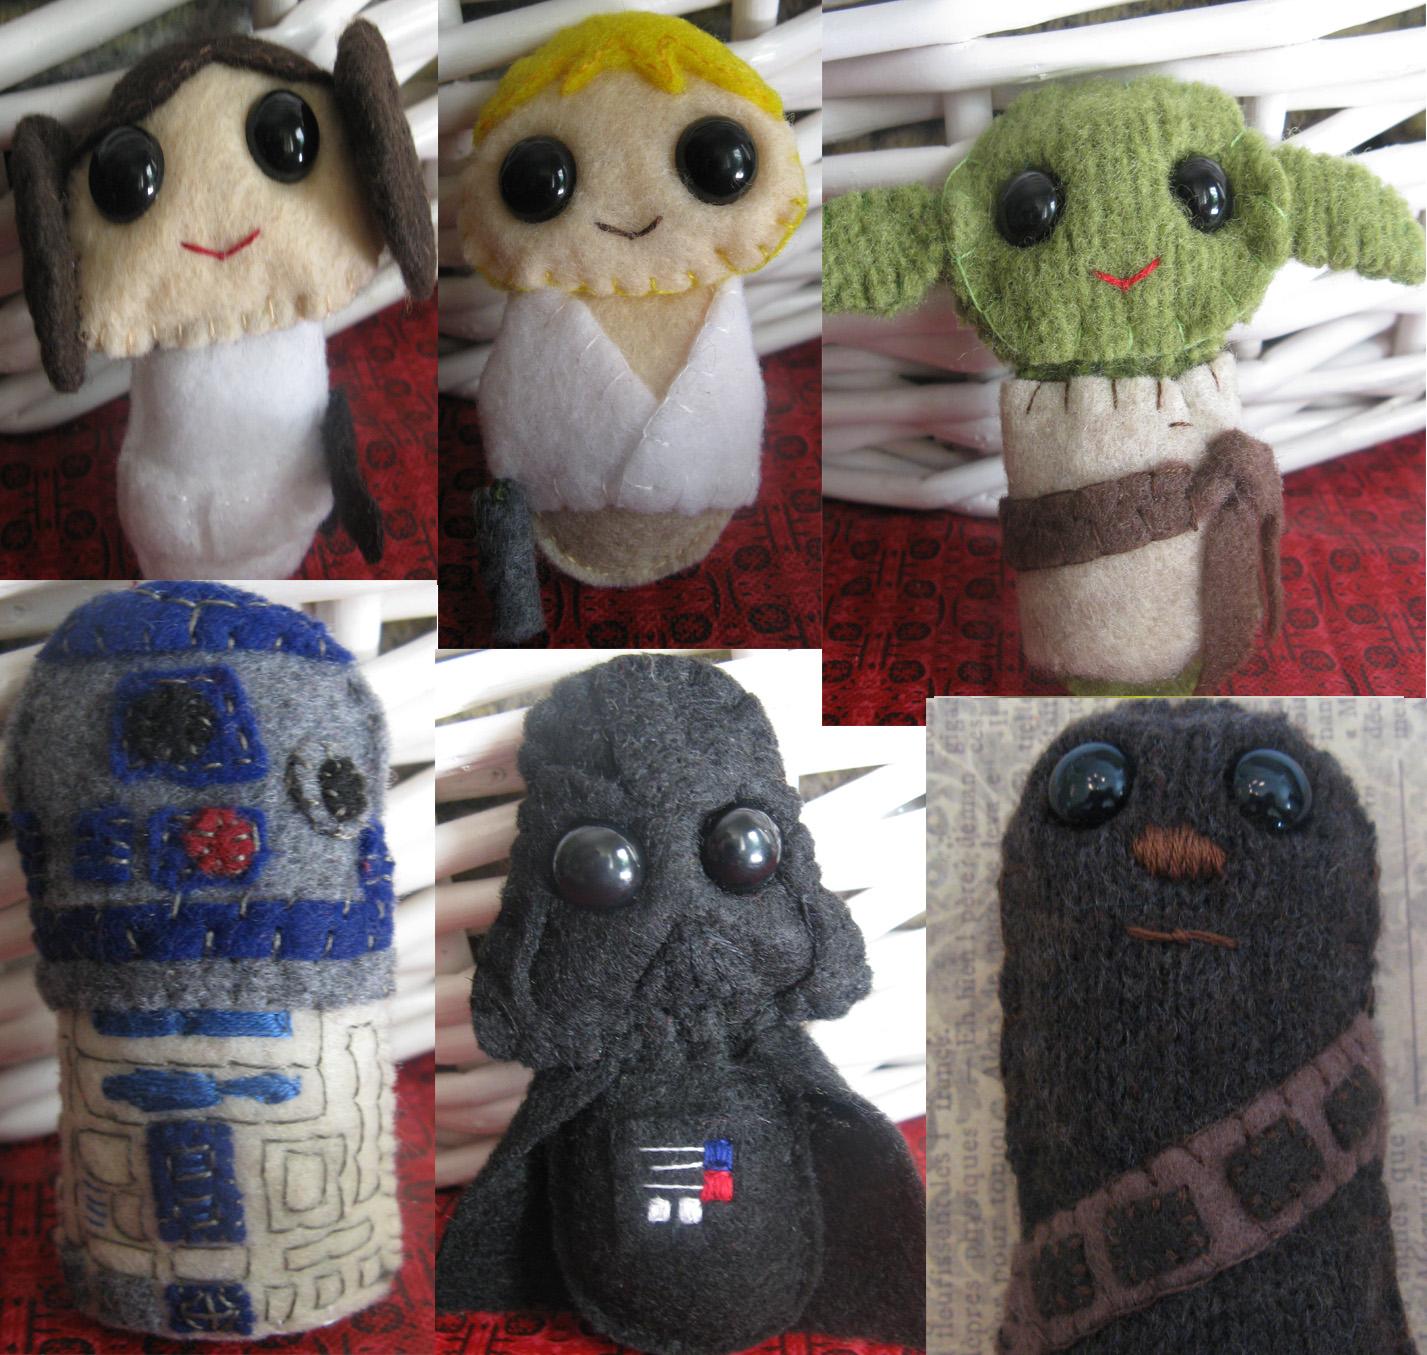 Star Wars peeps